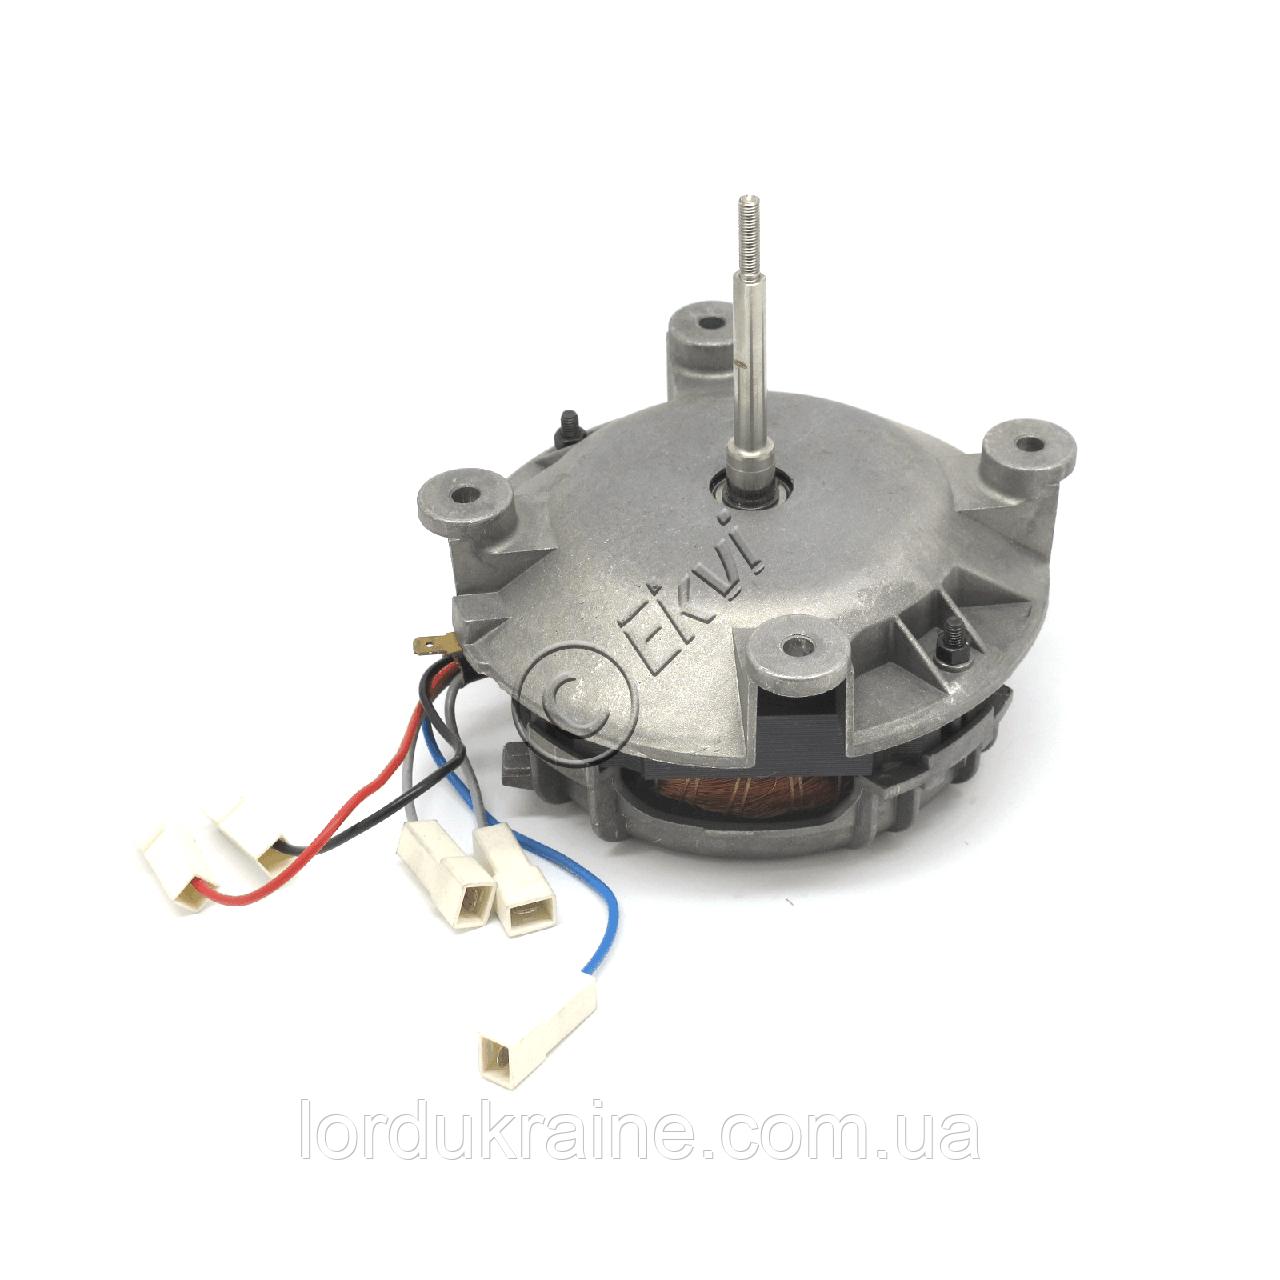 Двигатель VN027 для печей Unox XF 085 (КVN002)